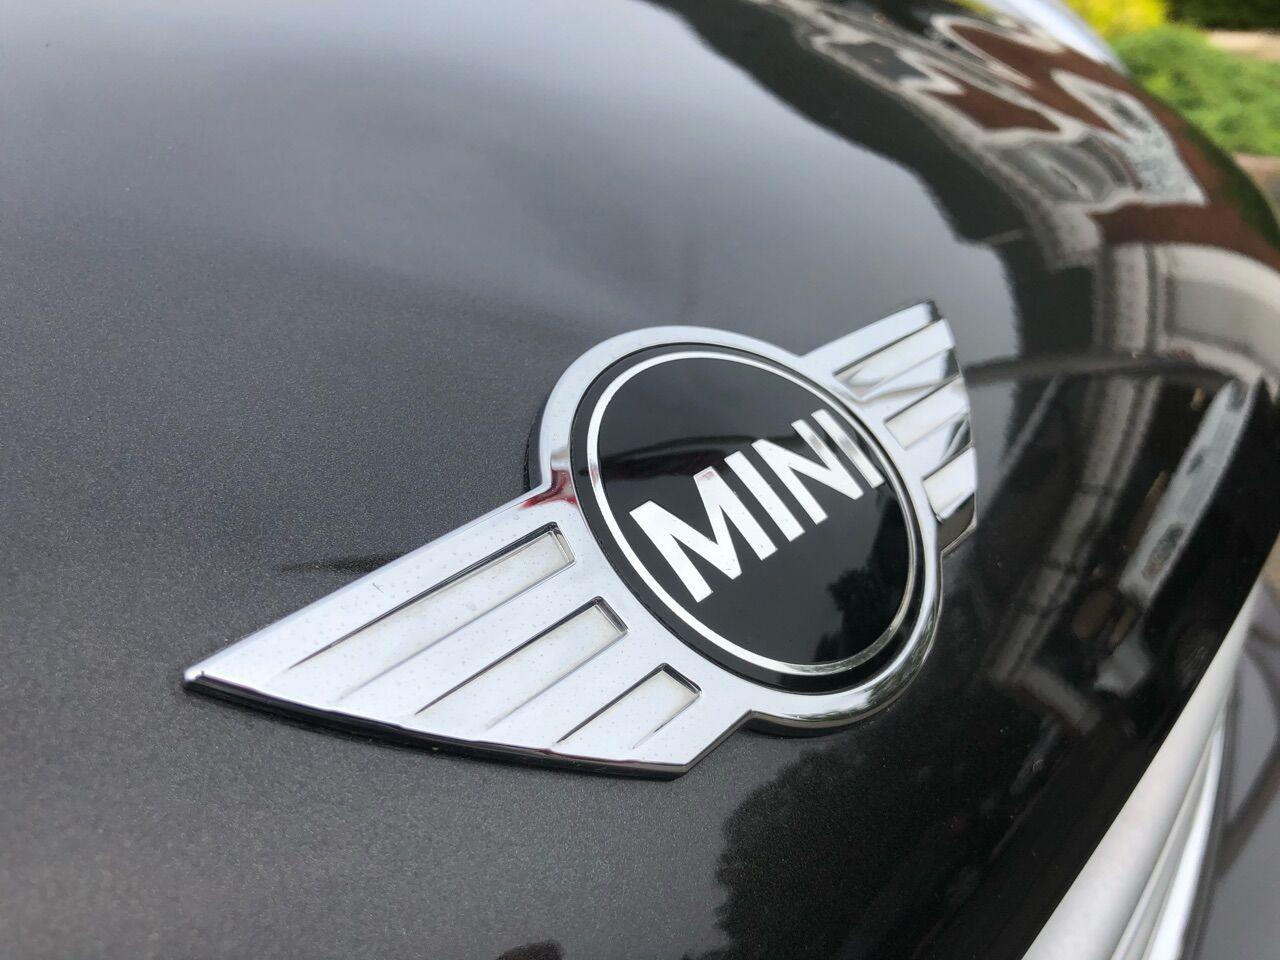 2015 MINI Countryman Sport Utility